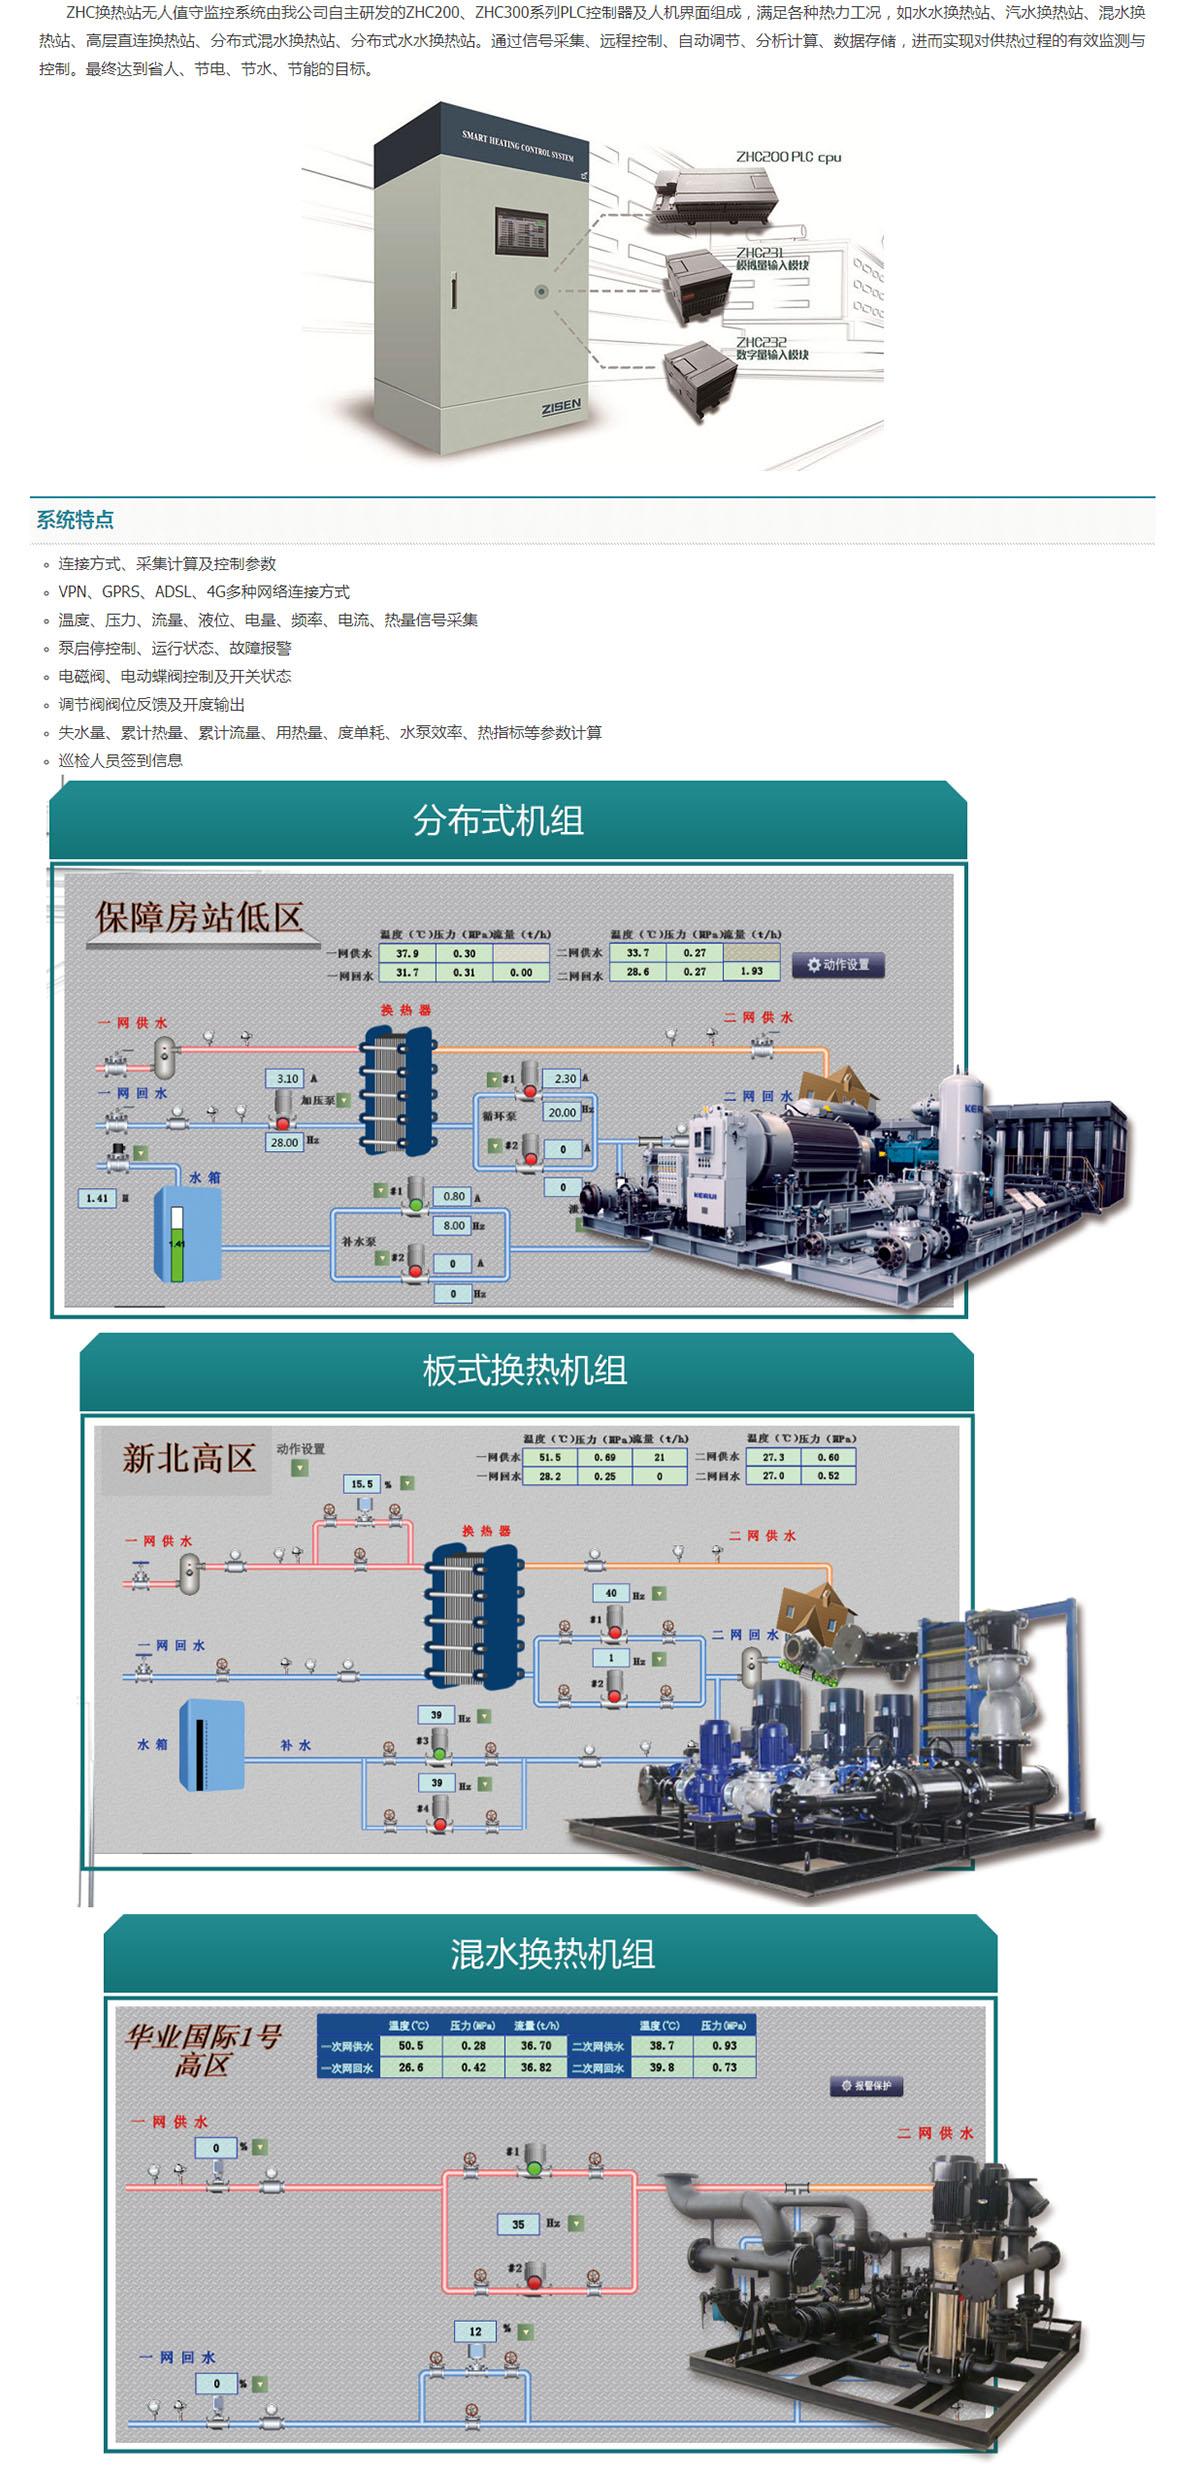 ZHC換熱站無人值守監控系統1.jpg